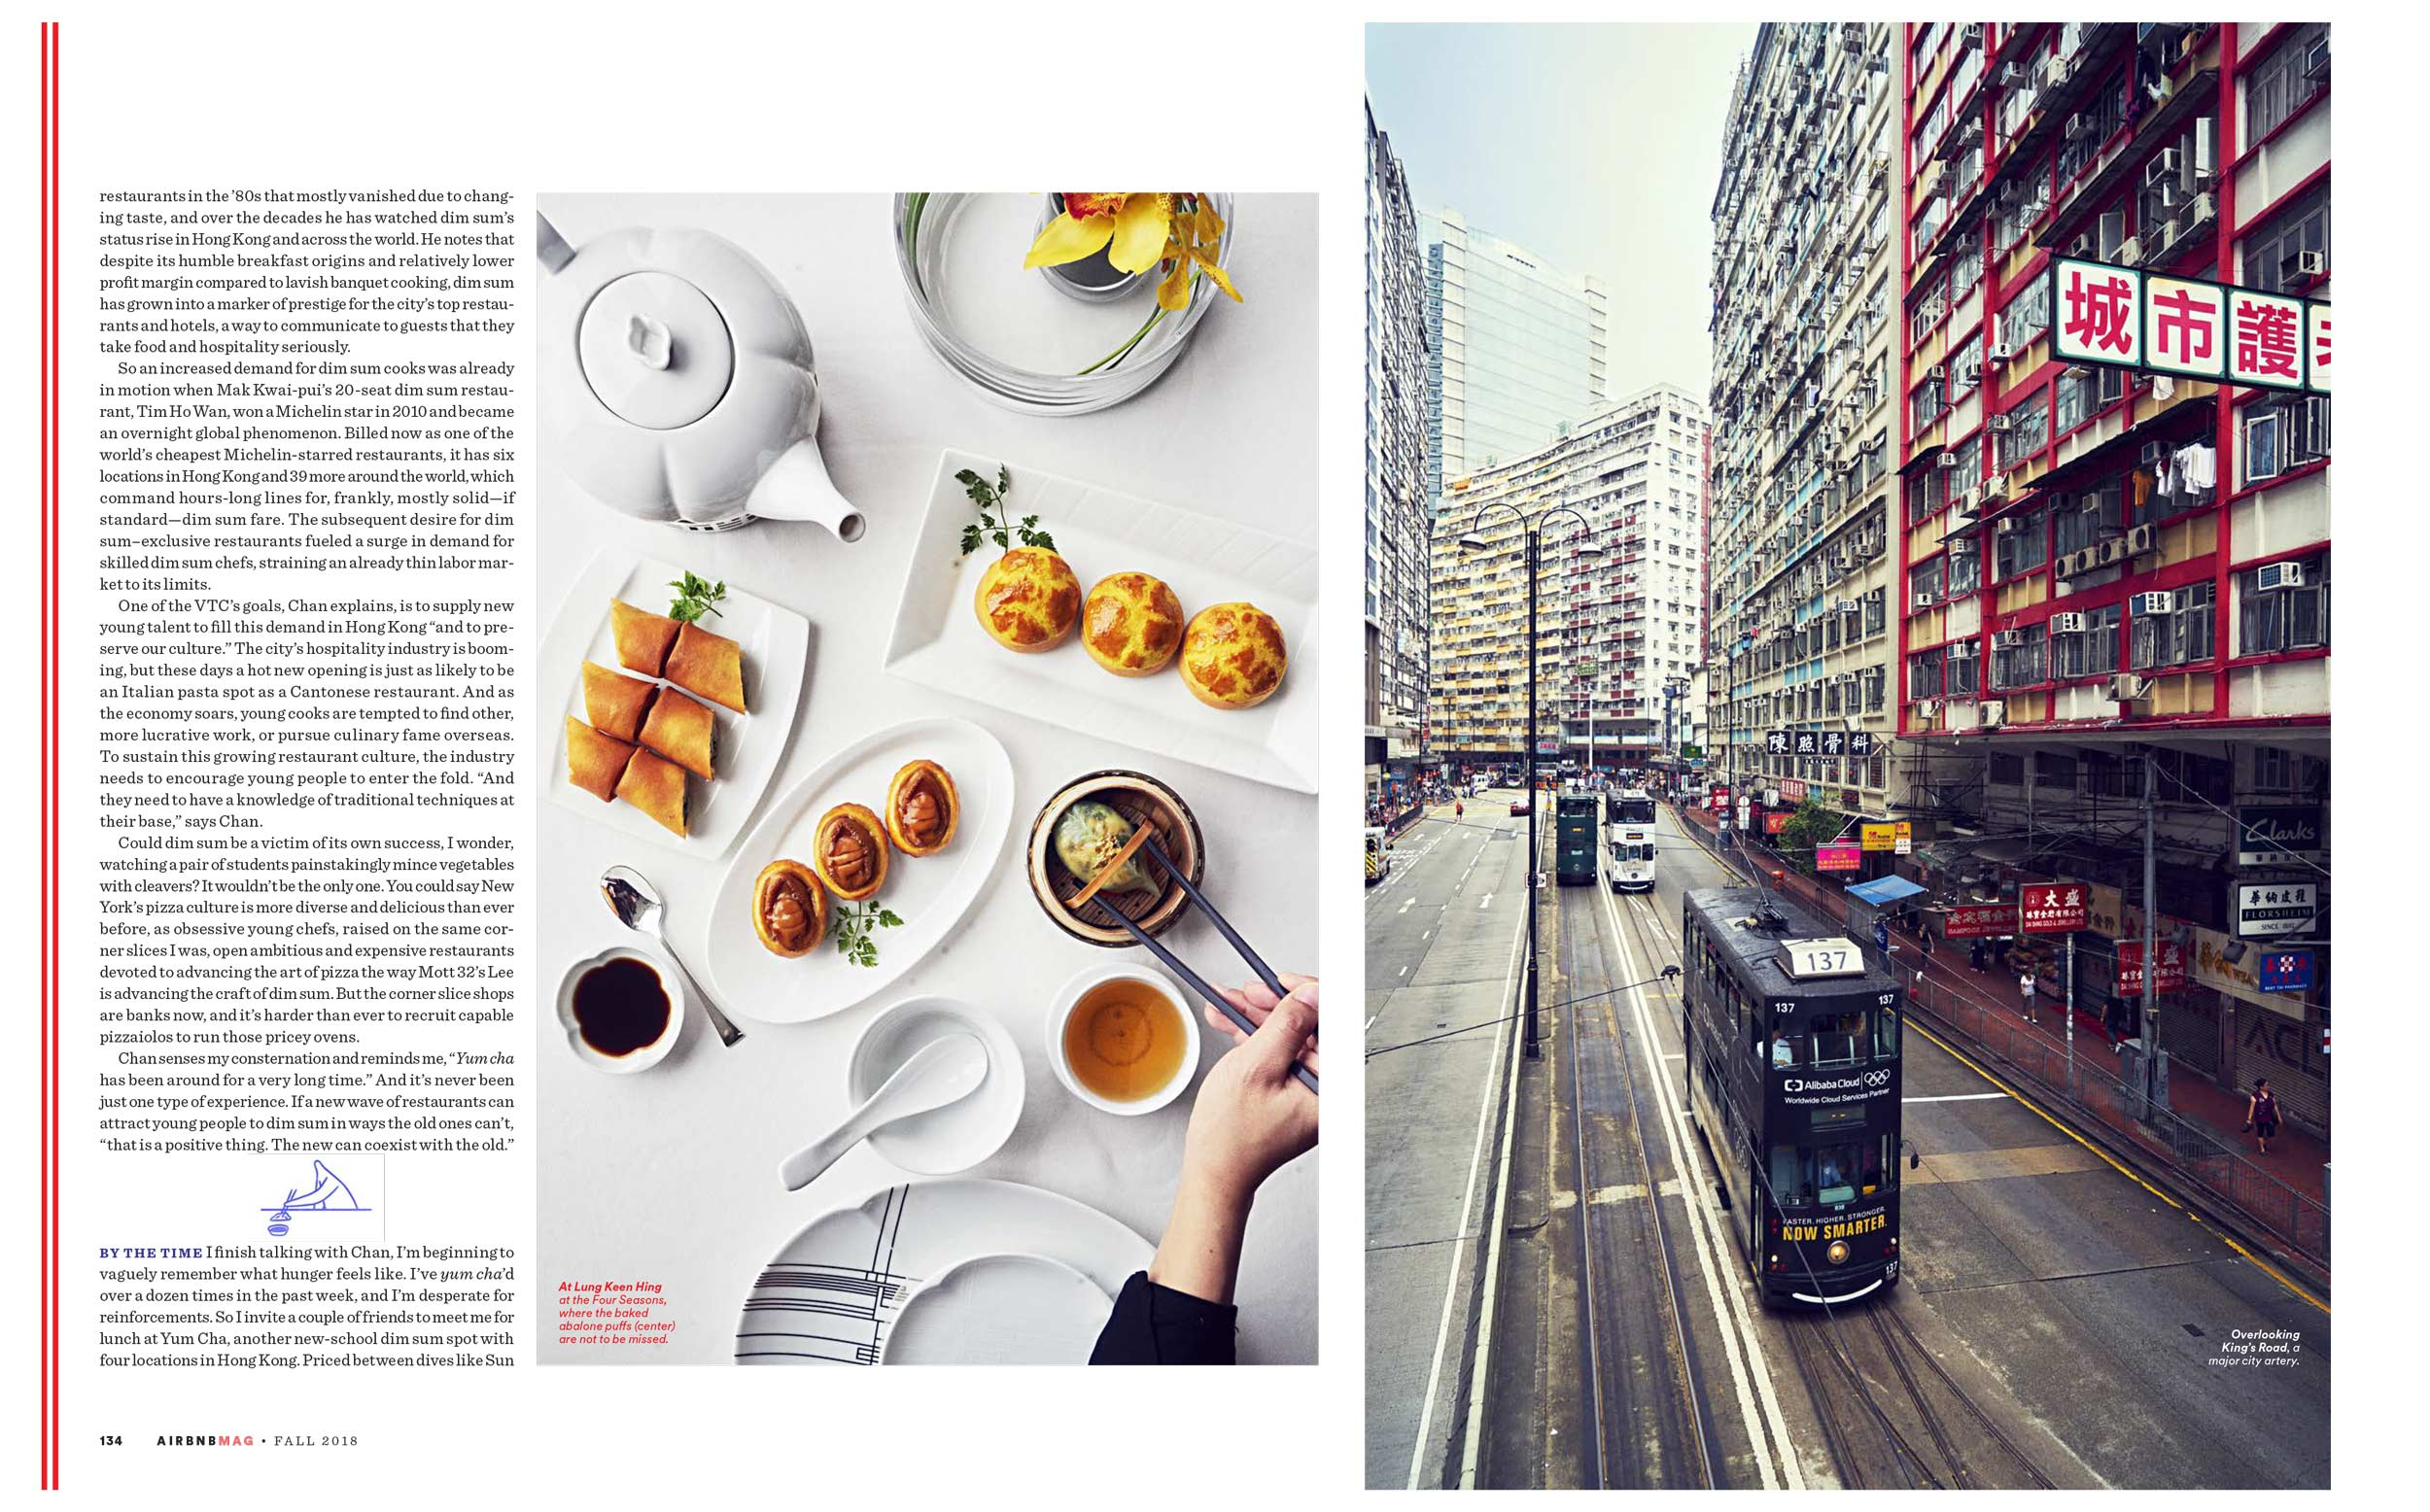 Marcus-Nilsson-Hong-Kong-5.jpg